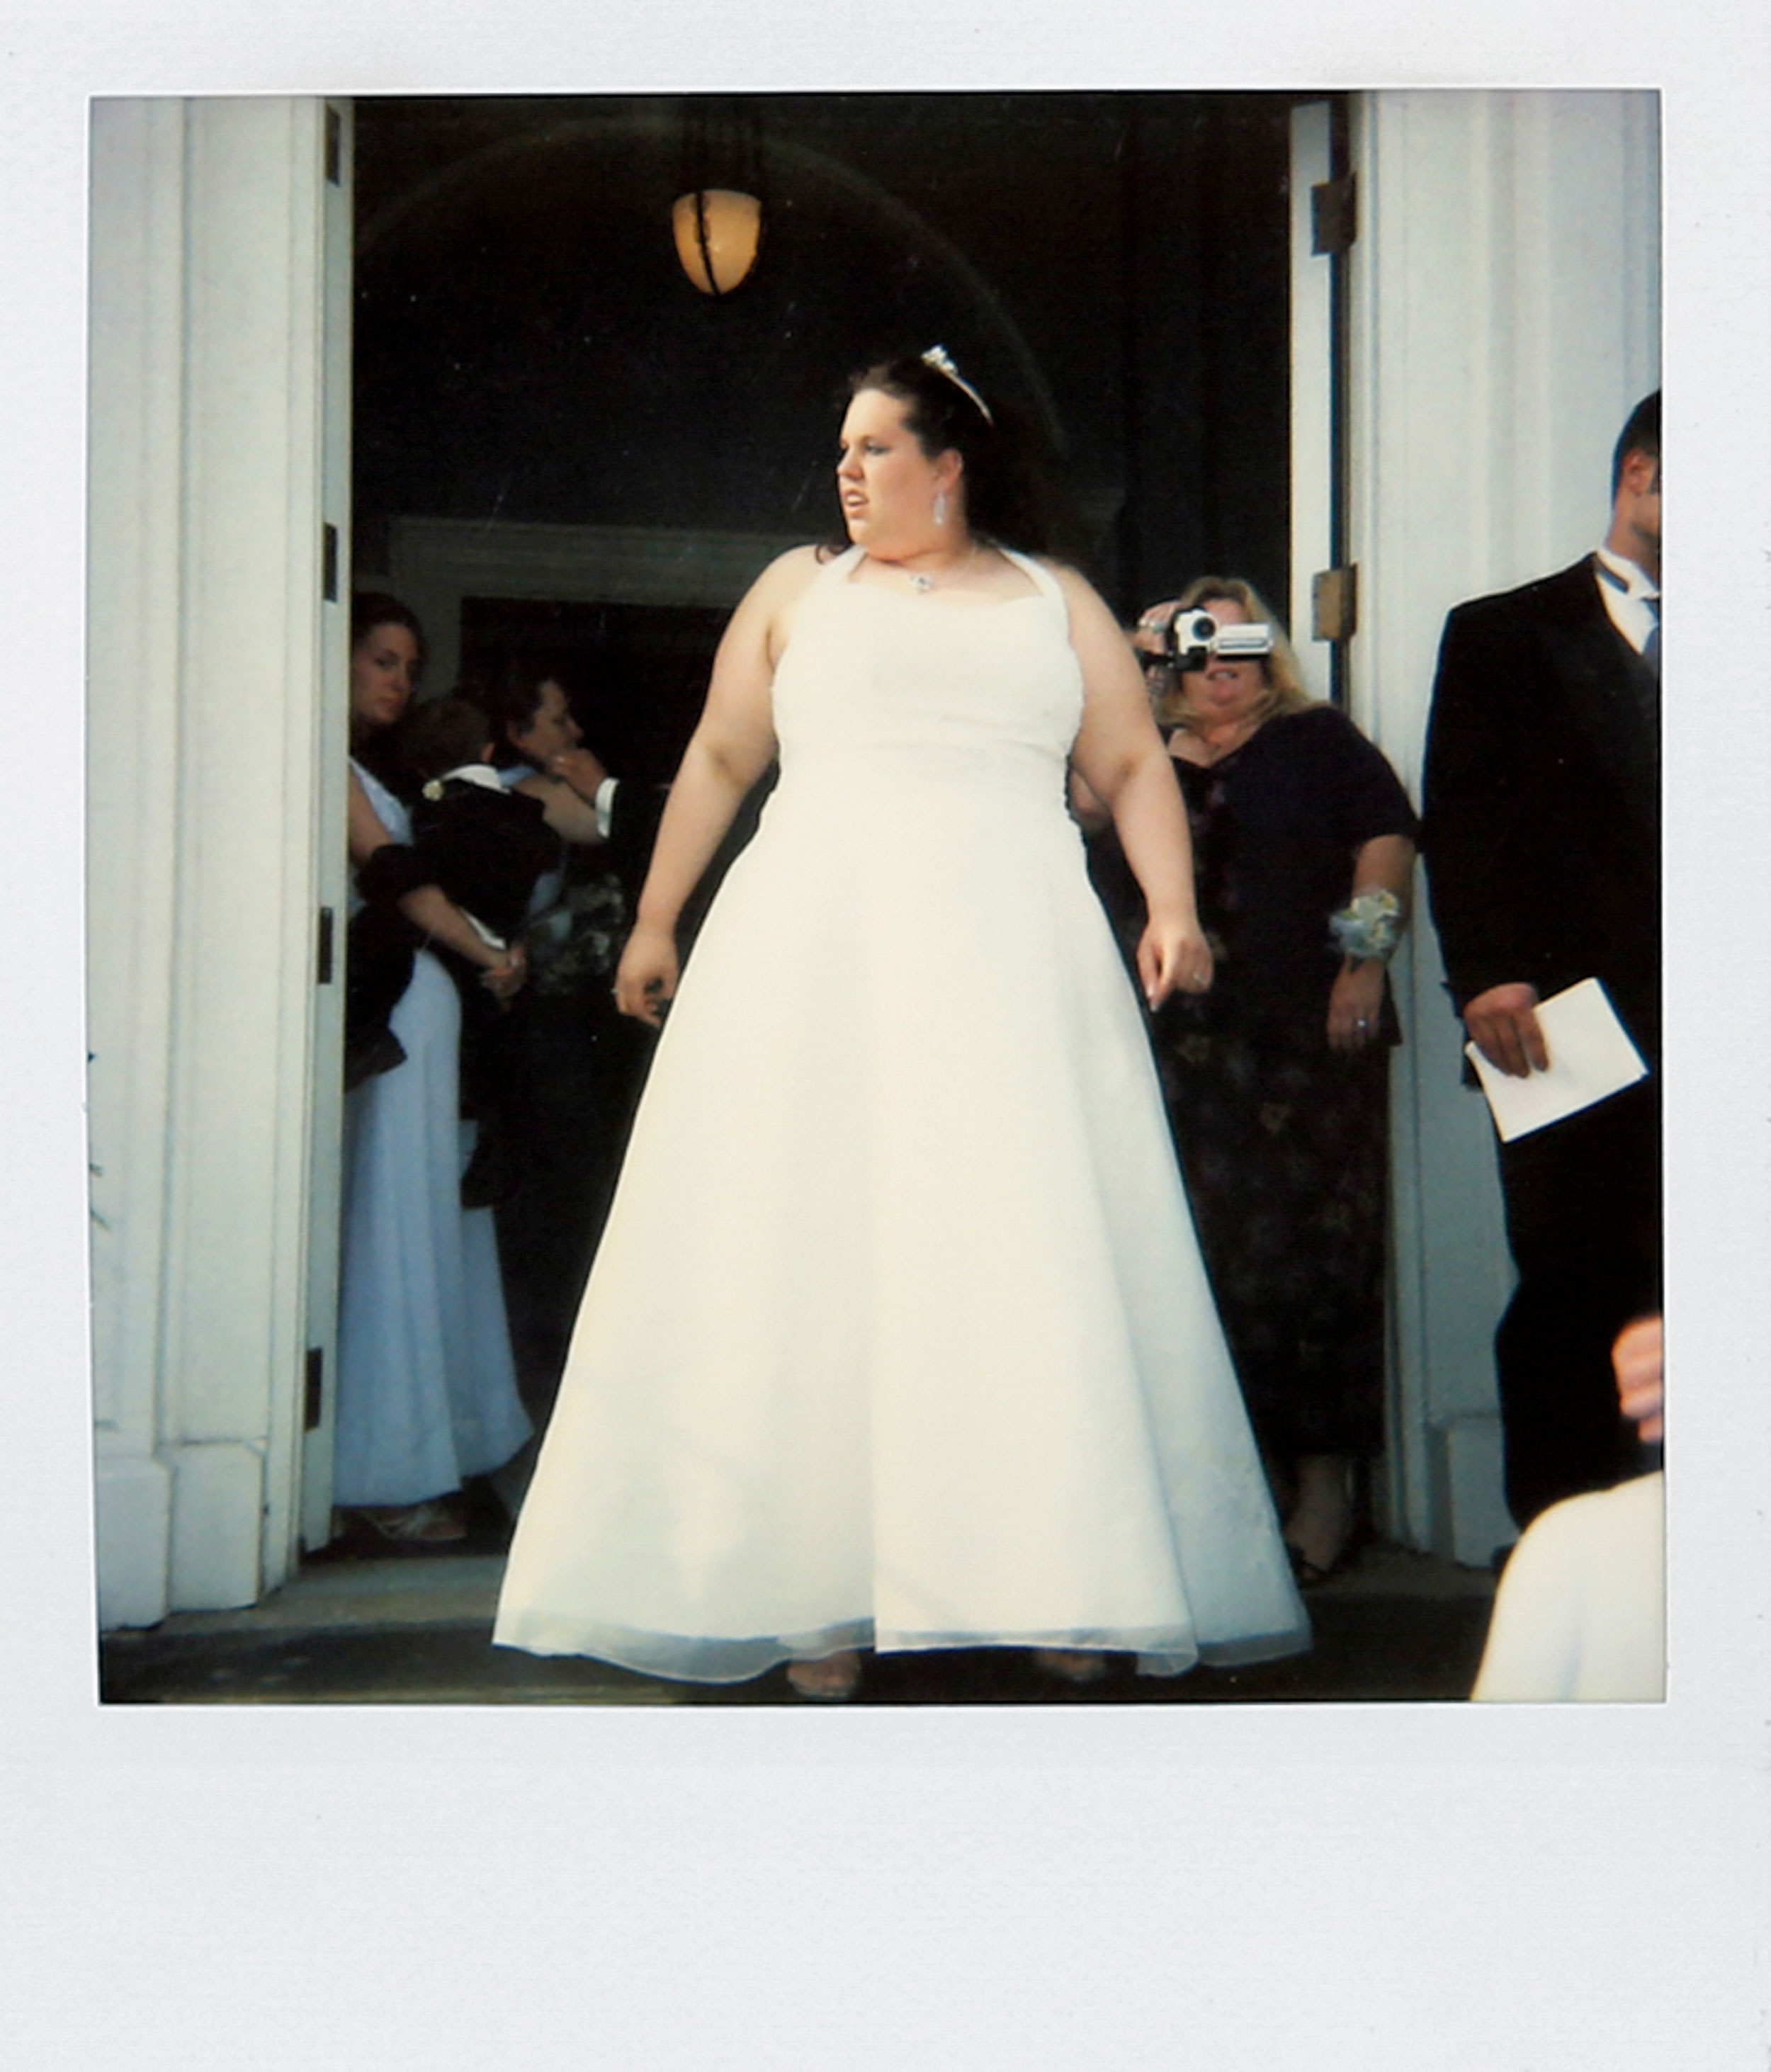 wedding-girl-1T4A7553.jpg